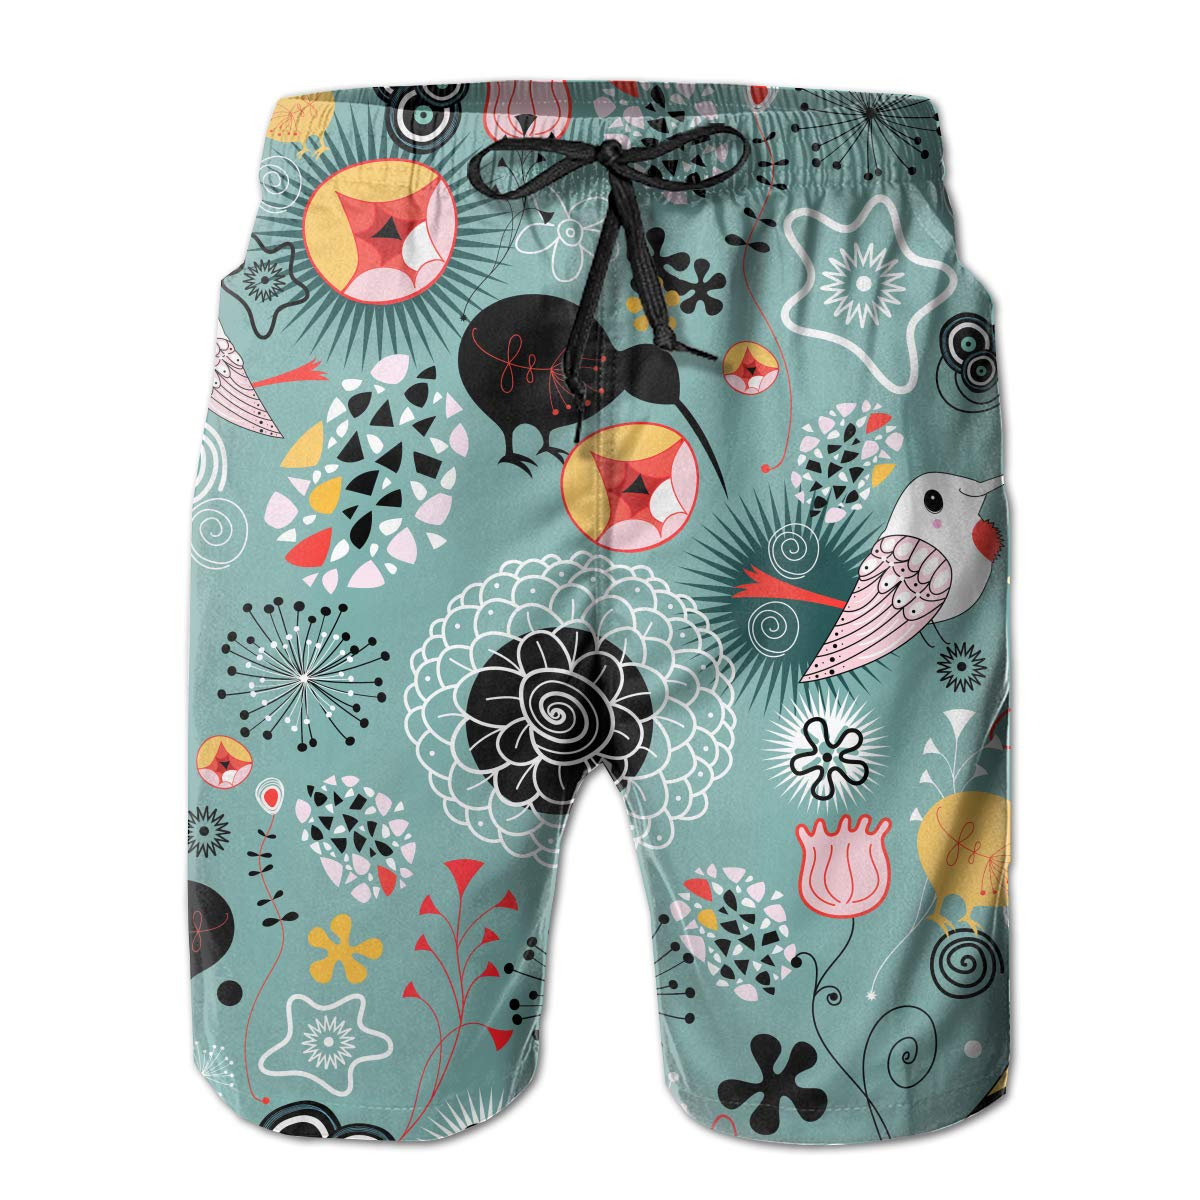 Floral with Birds Mens Quick Dry Swim Trunks Beach Board Short Mesh Lining Summer Sports Running Shorts